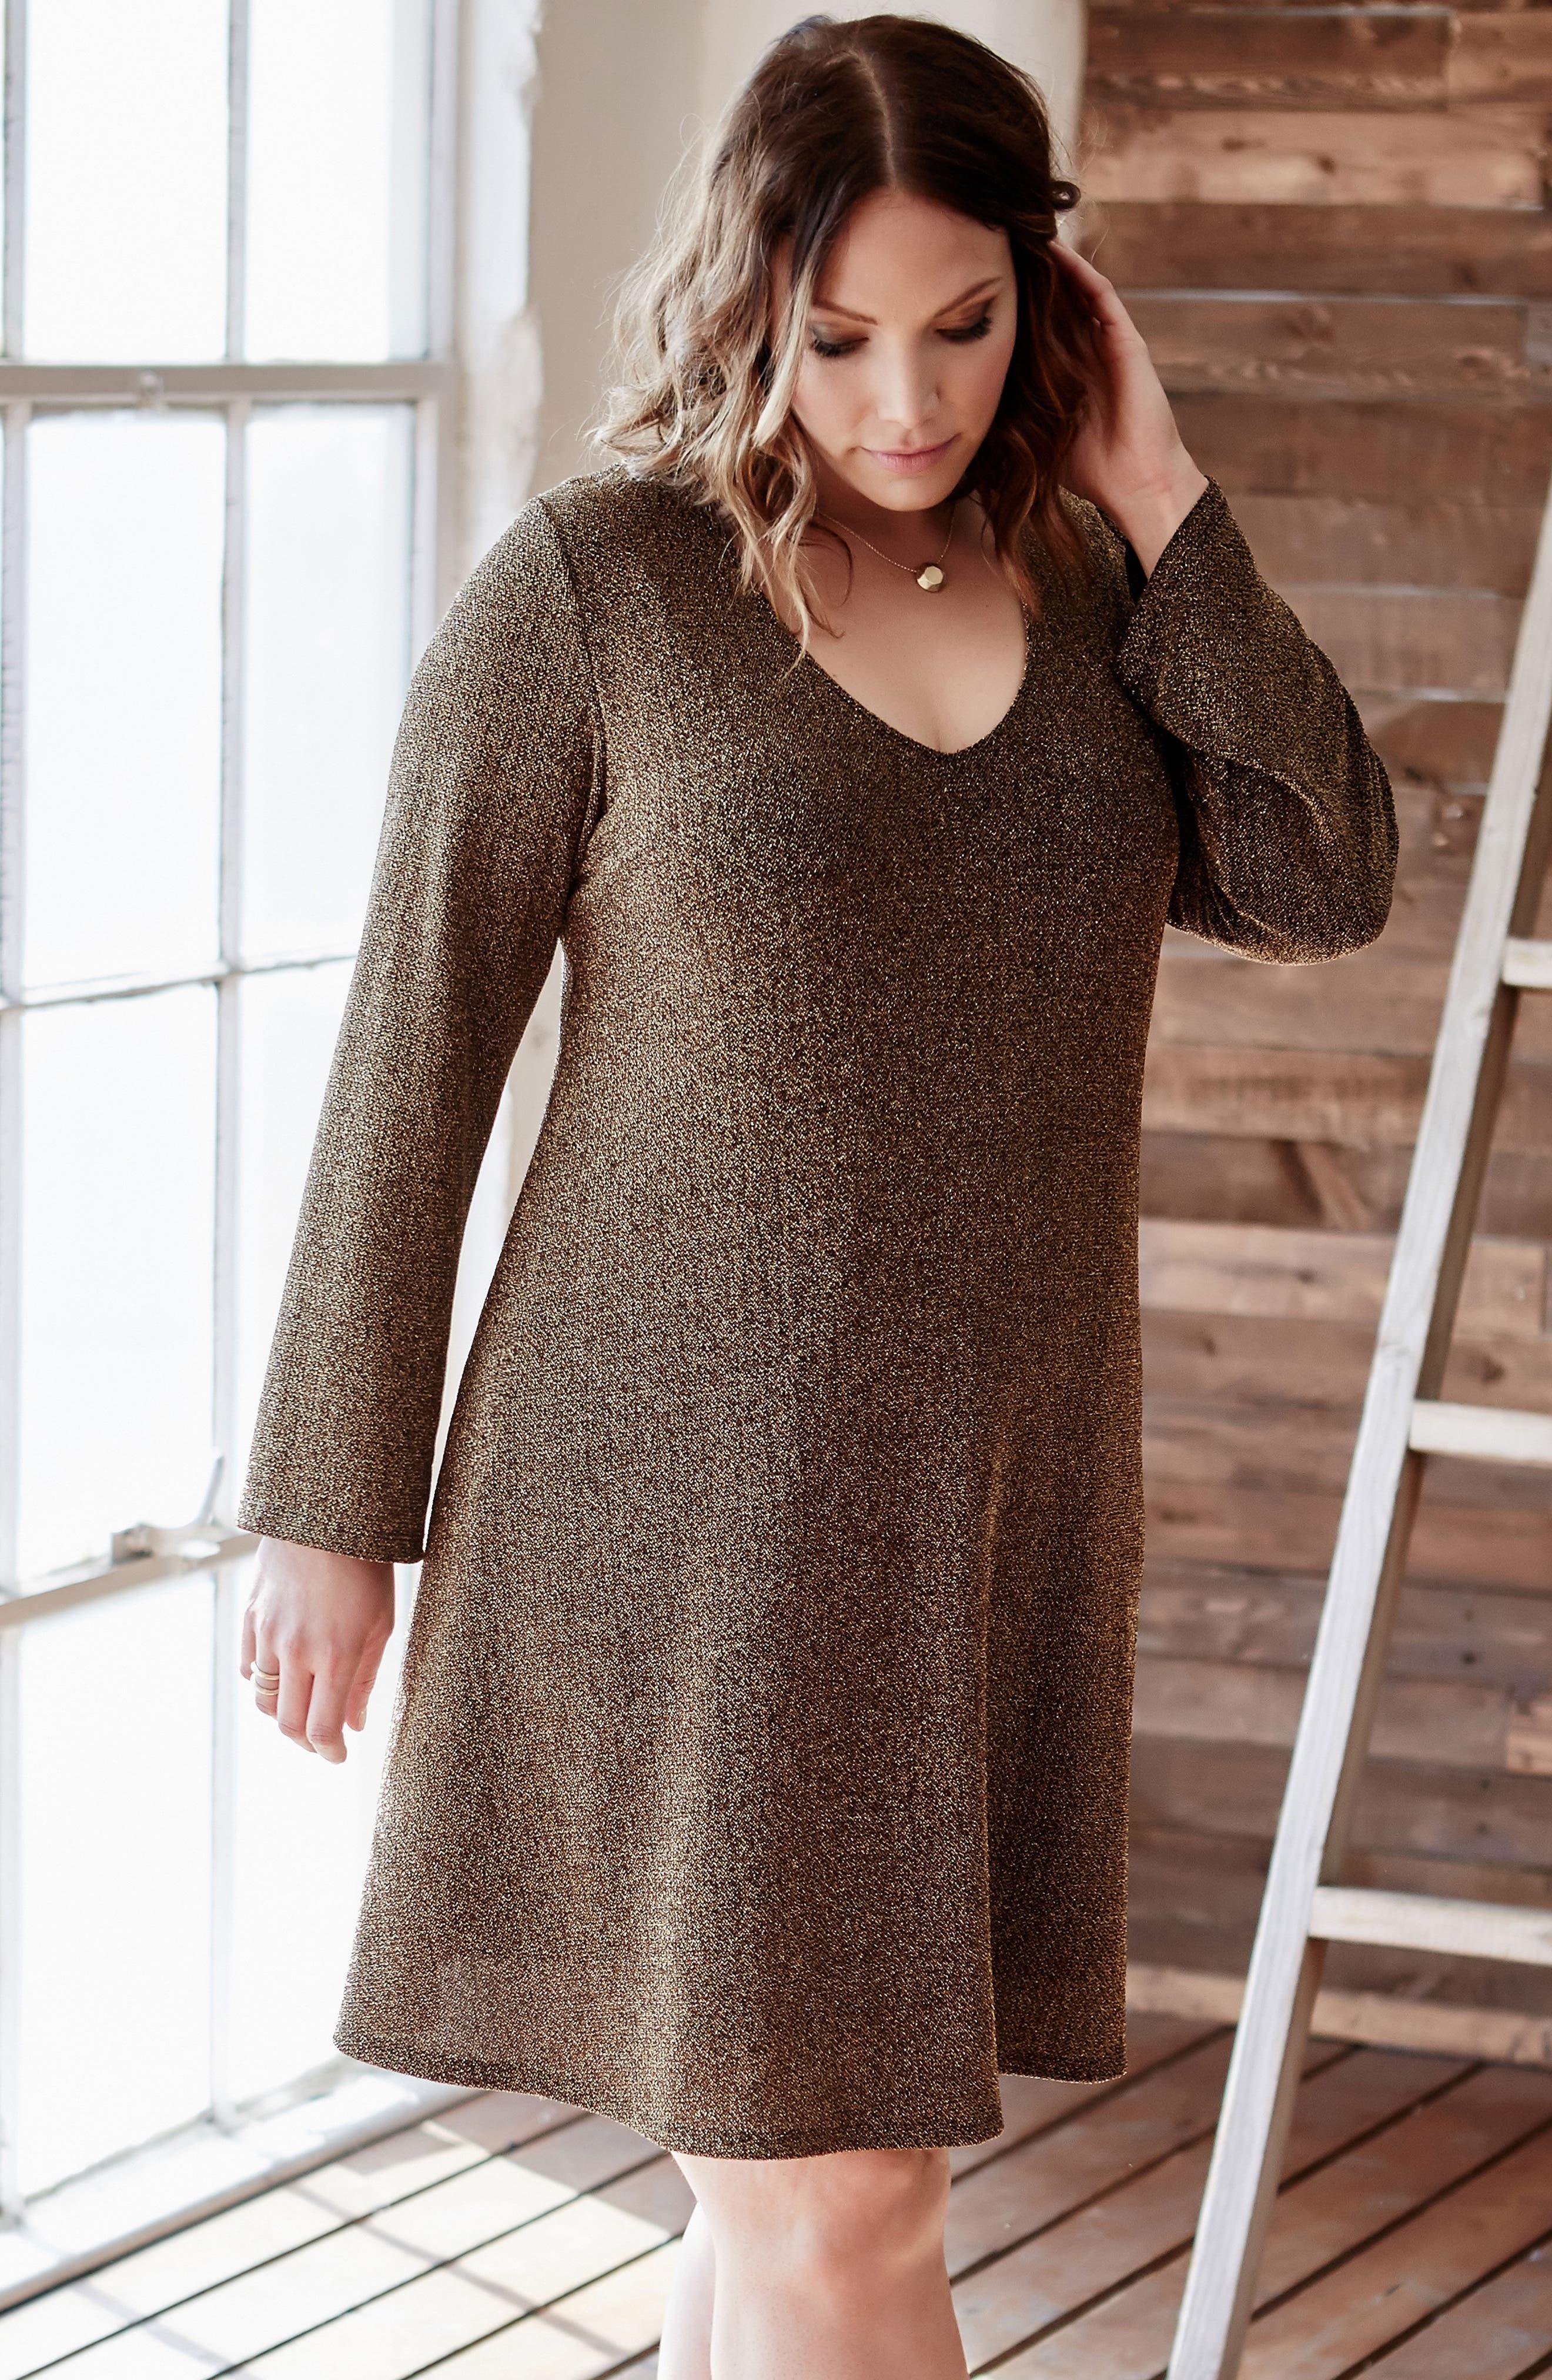 Taylor Gold Knit Dress,                             Alternate thumbnail 2, color,                             Gold